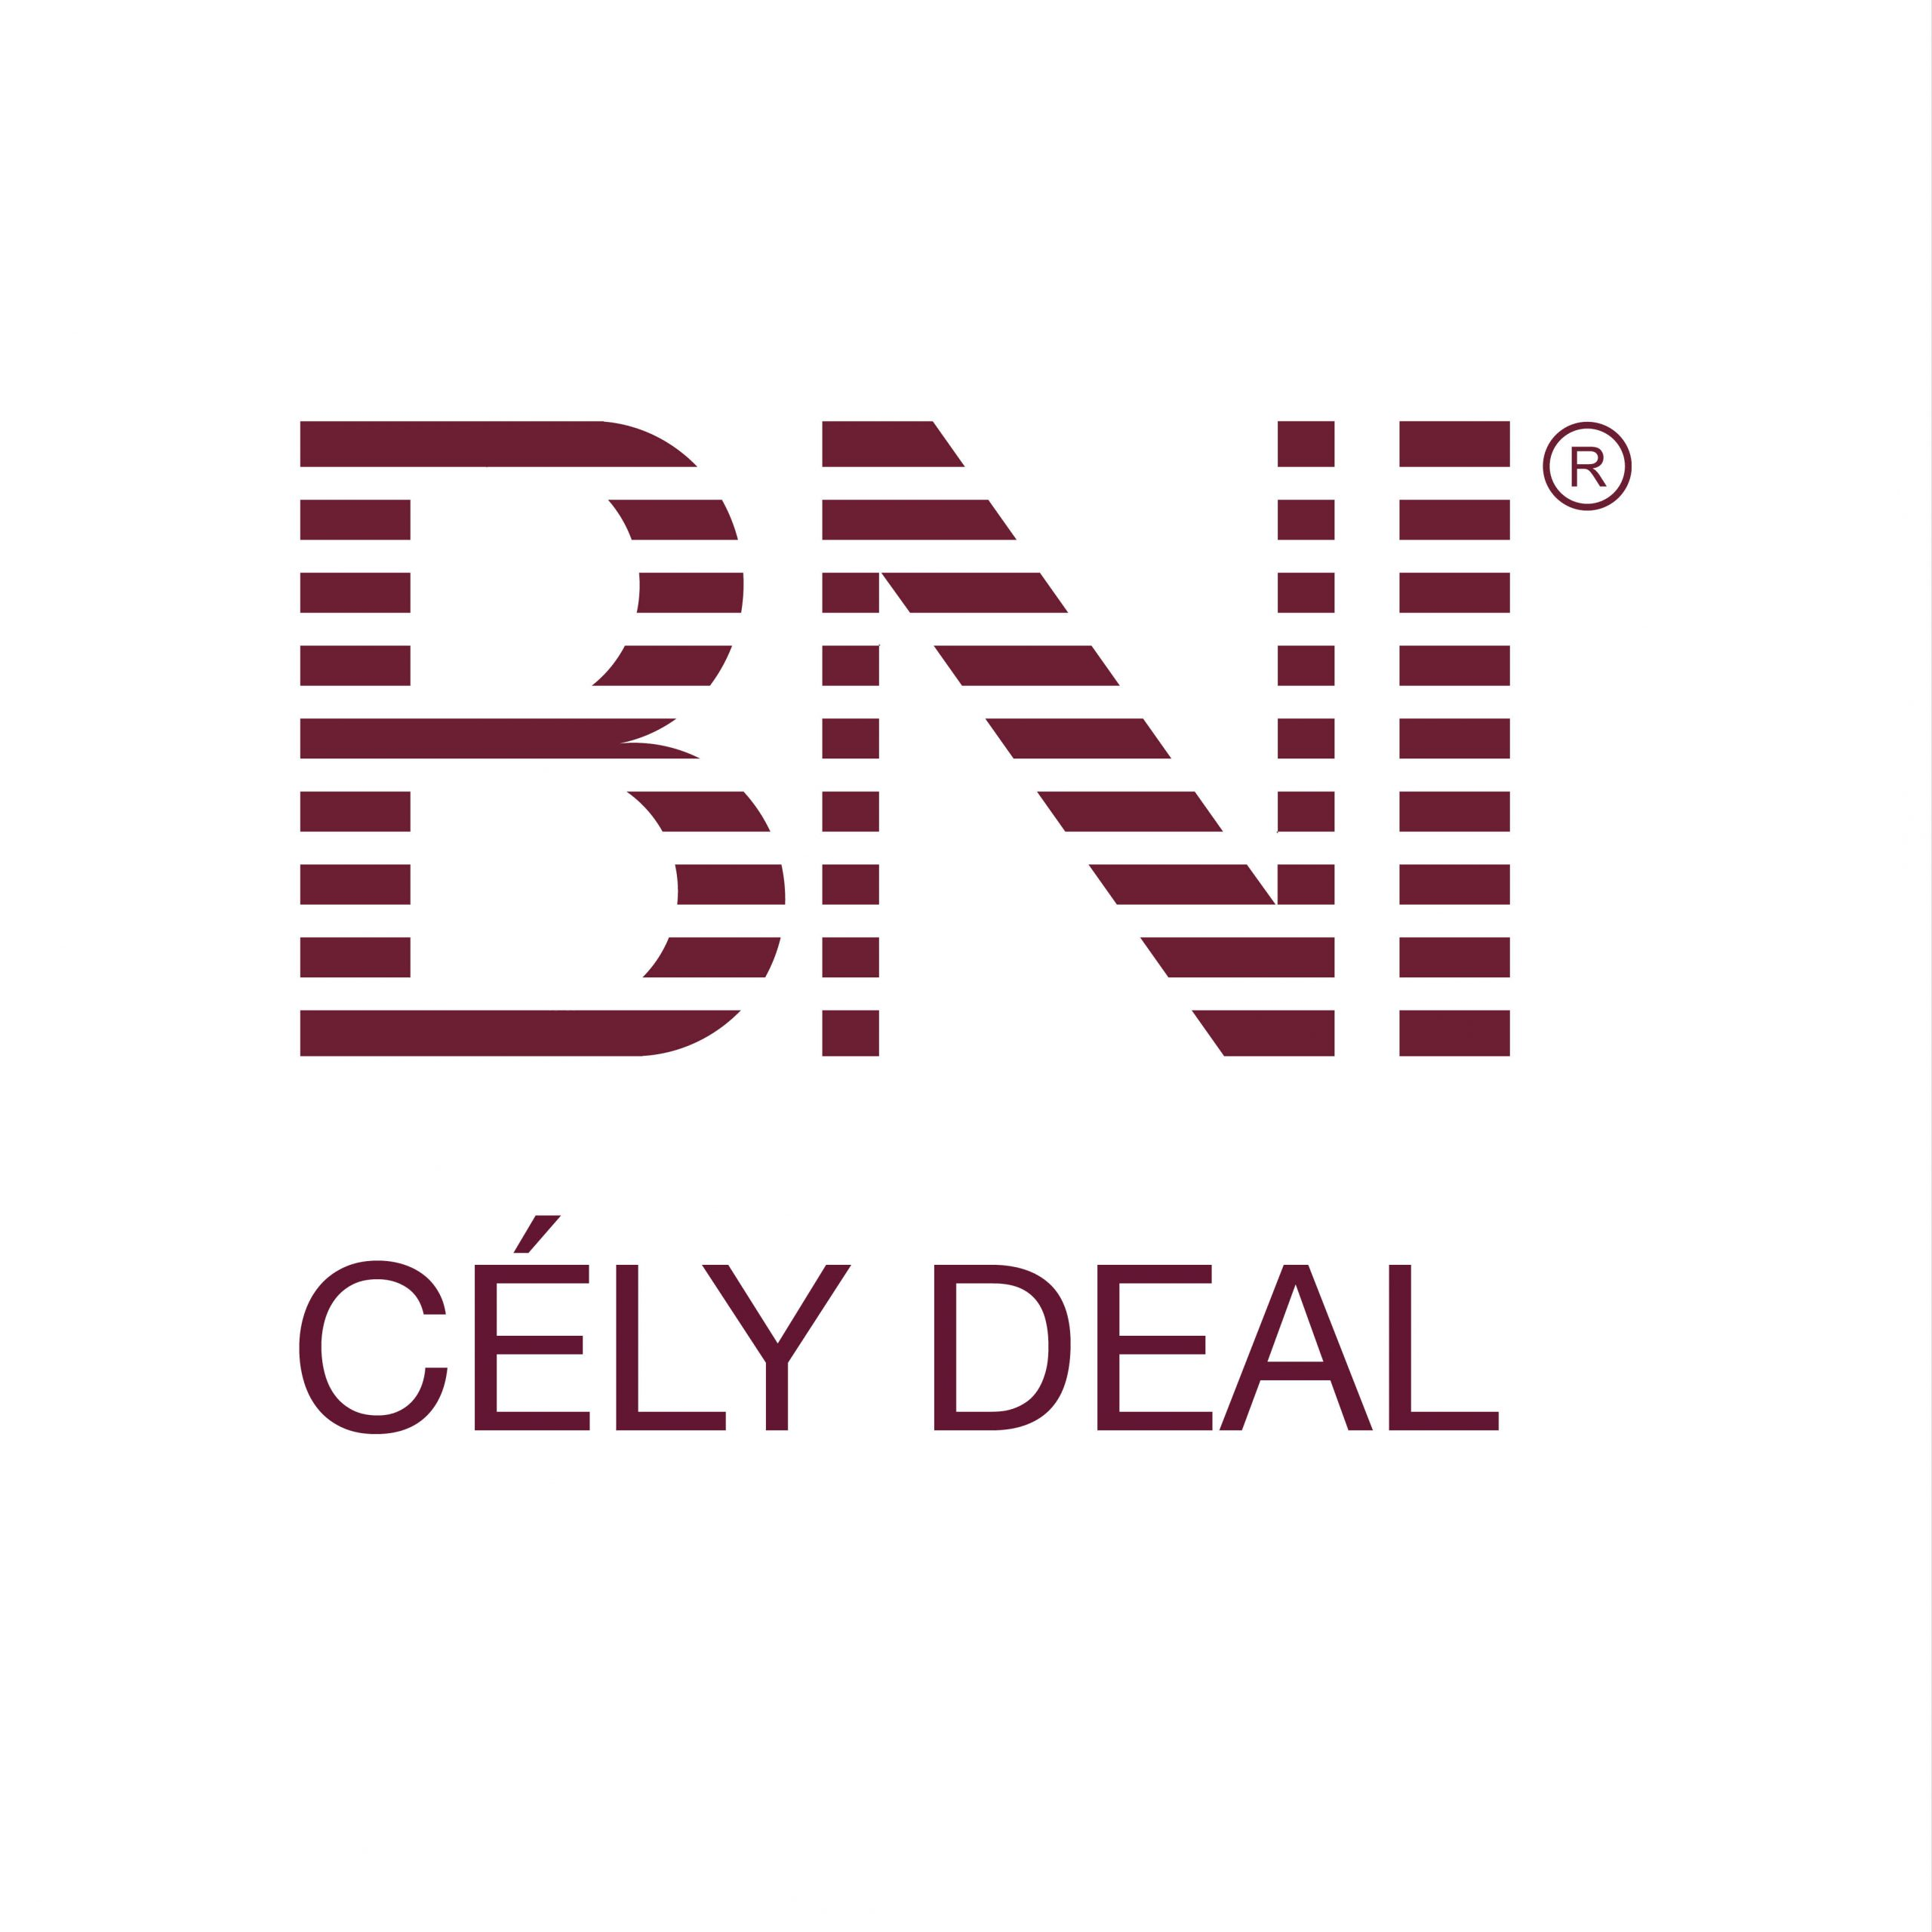 BNI-CELY-DEAL-Seine-et-Marne